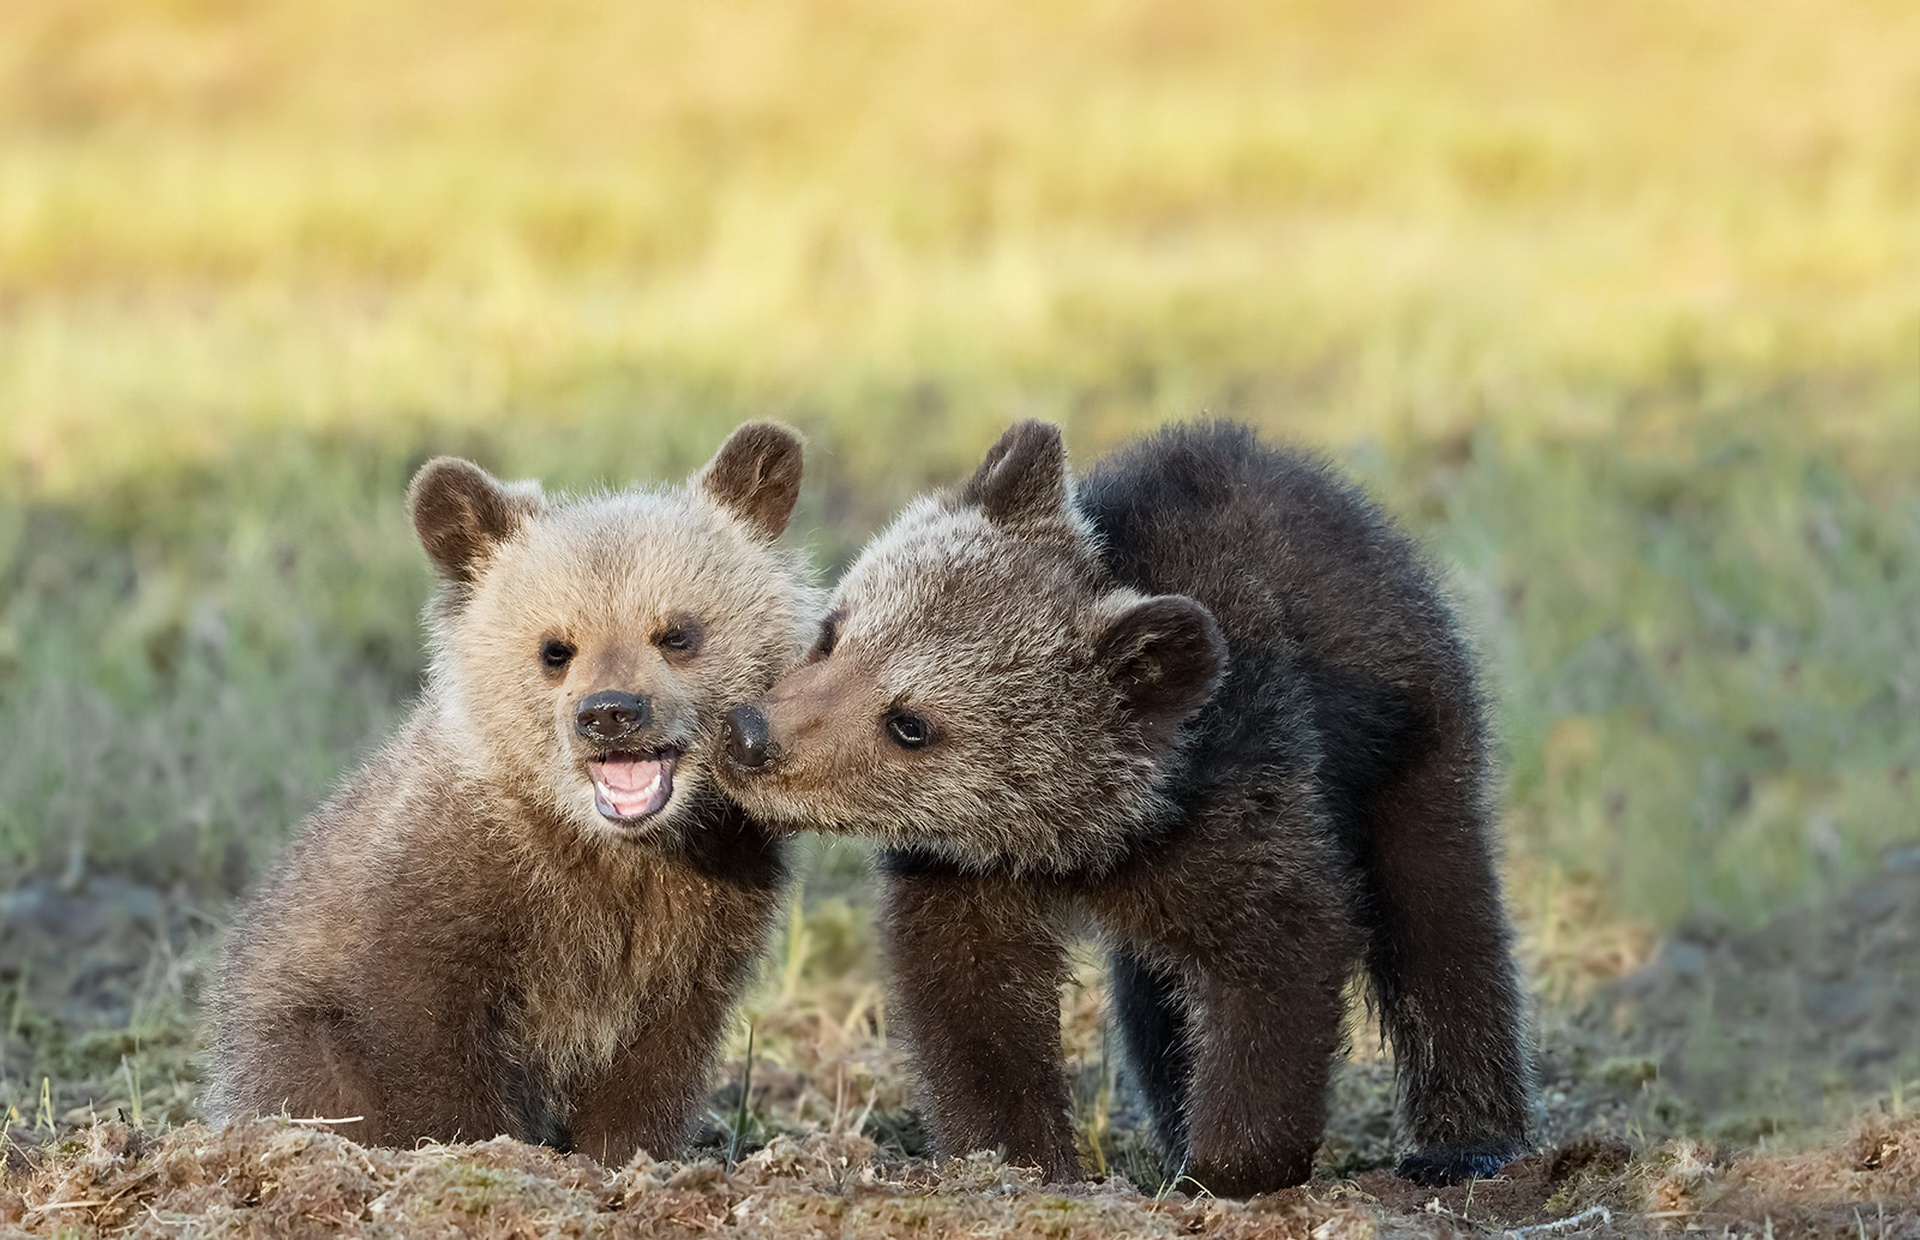 полугодовалый медвежонок фото денег